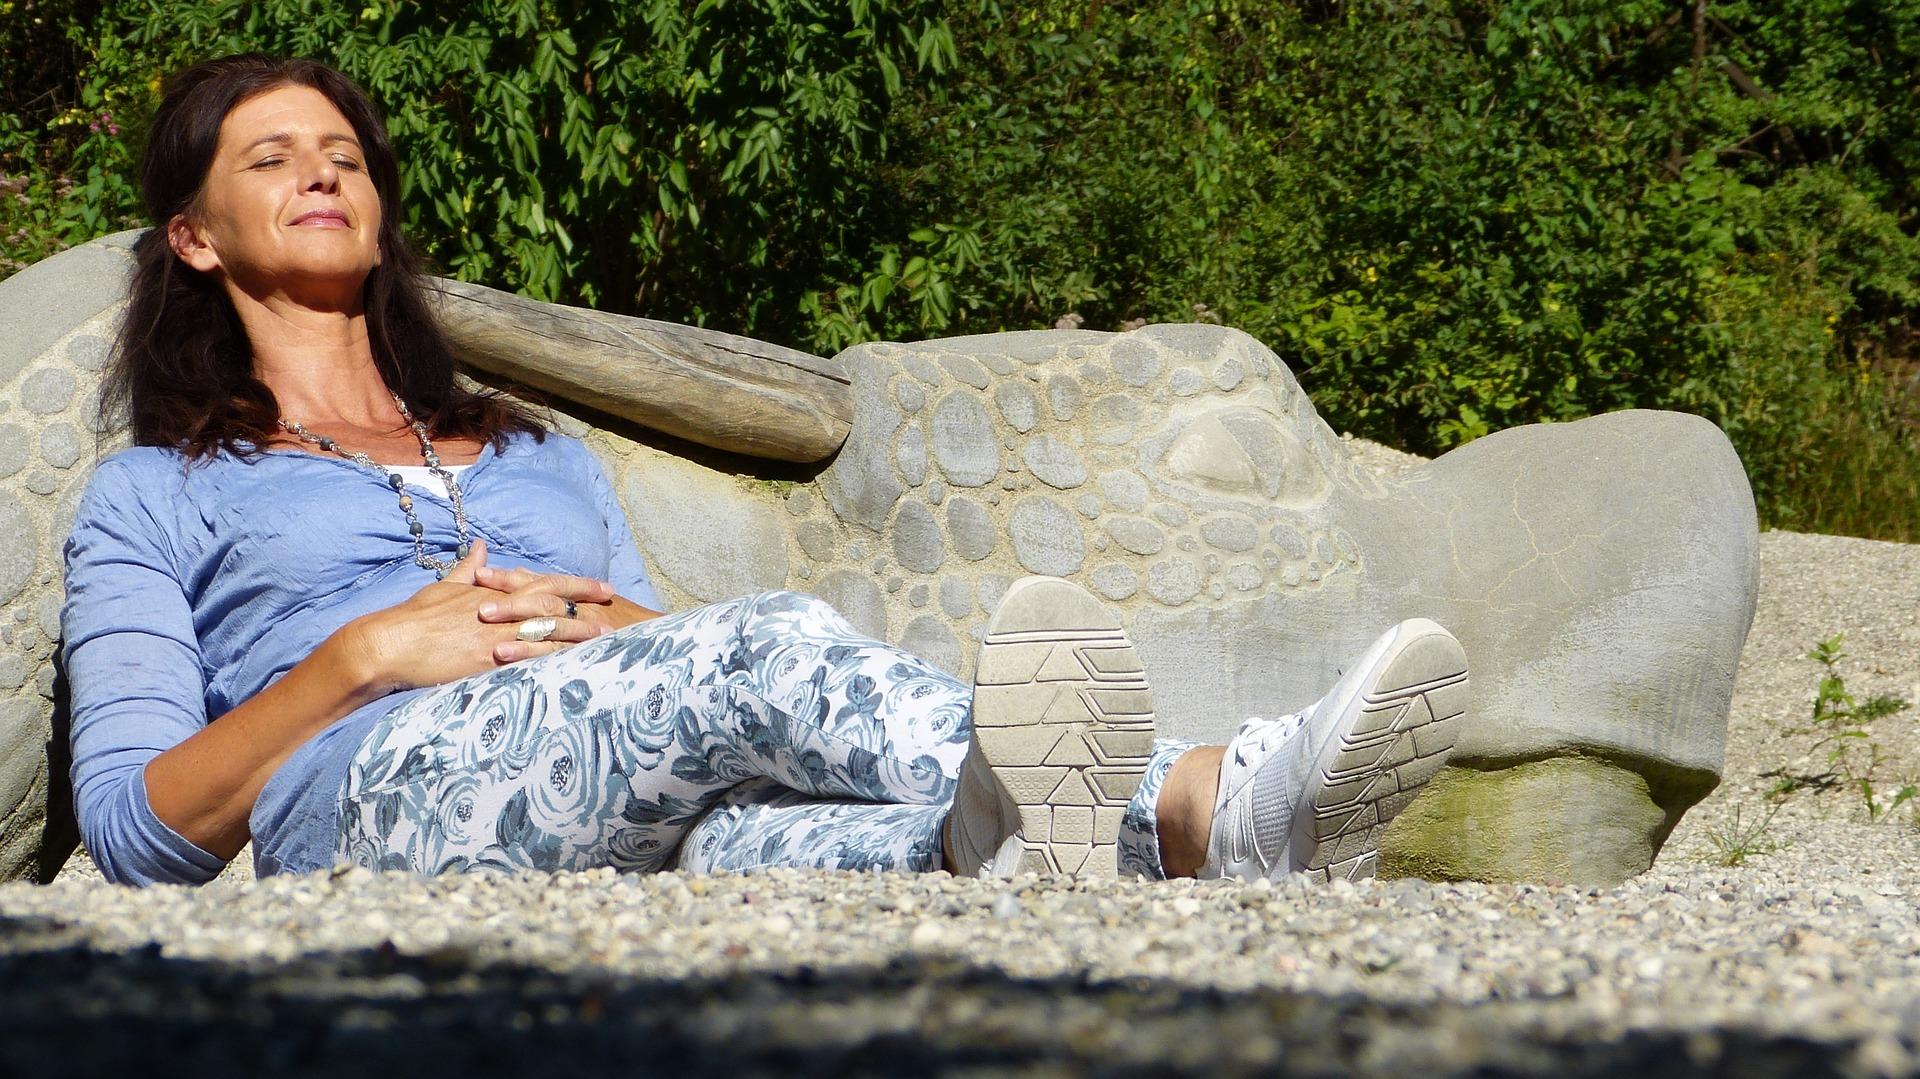 Seeking to alleviate syptoms of menopause